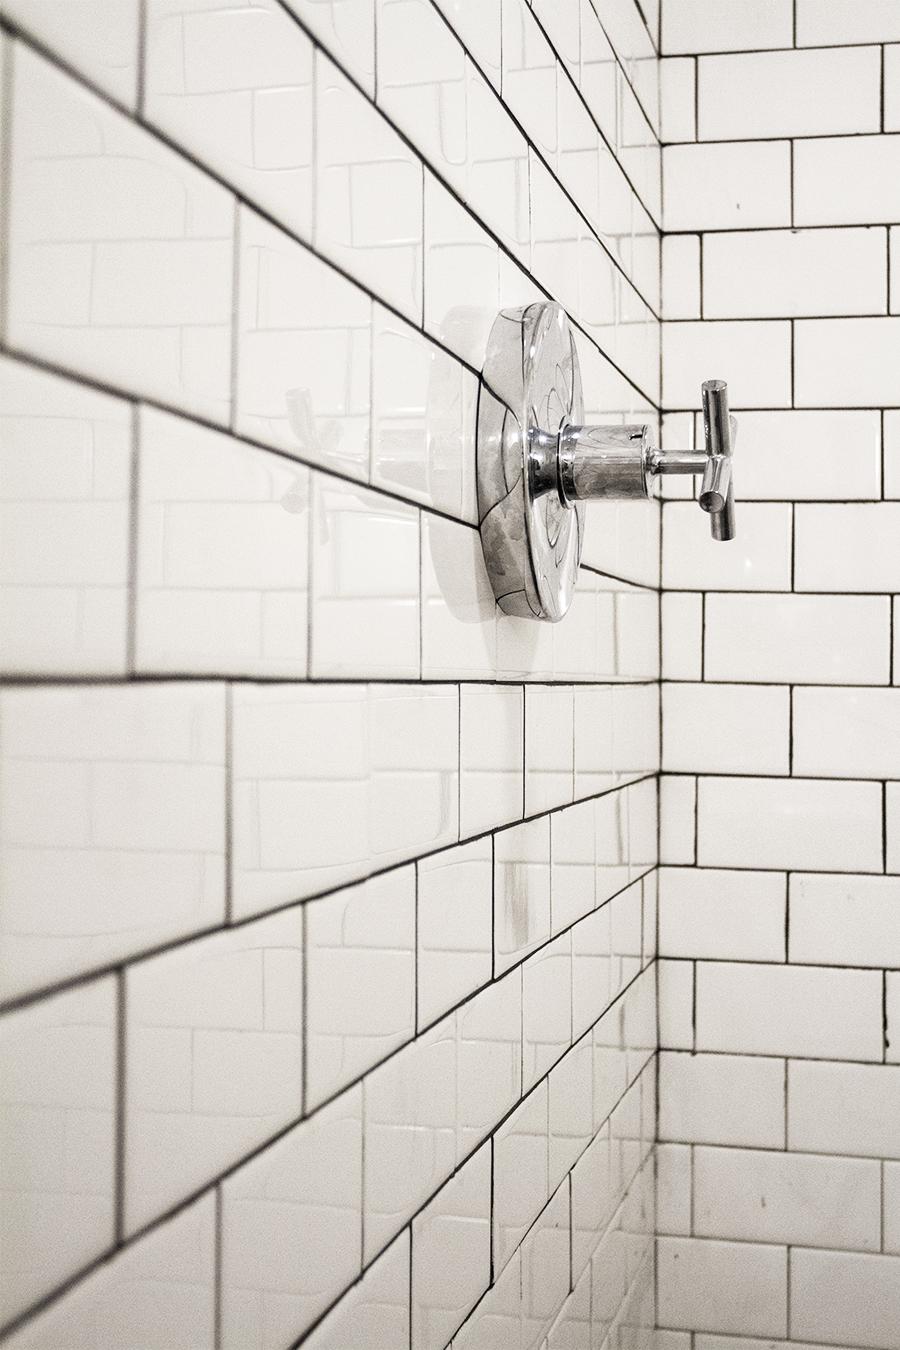 Kohler Fixtures with Subway Tile